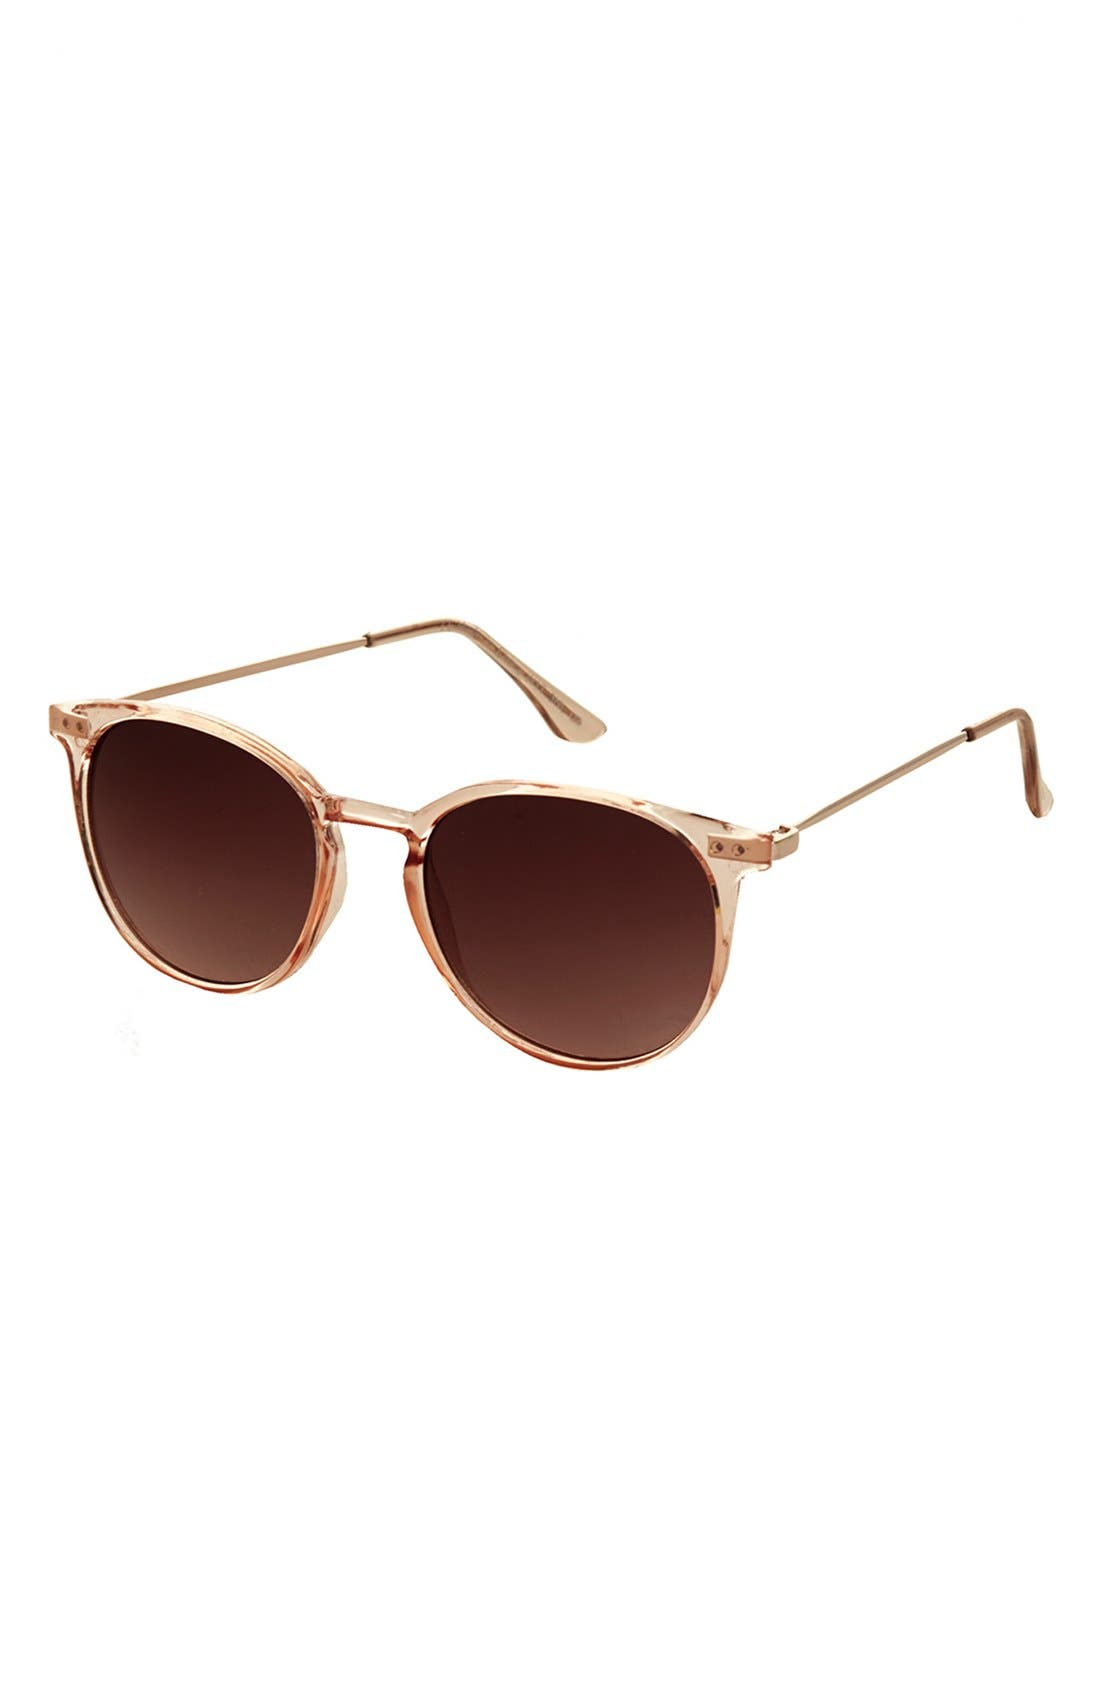 Main Image - Topshop 51mm Slim Sunglasses